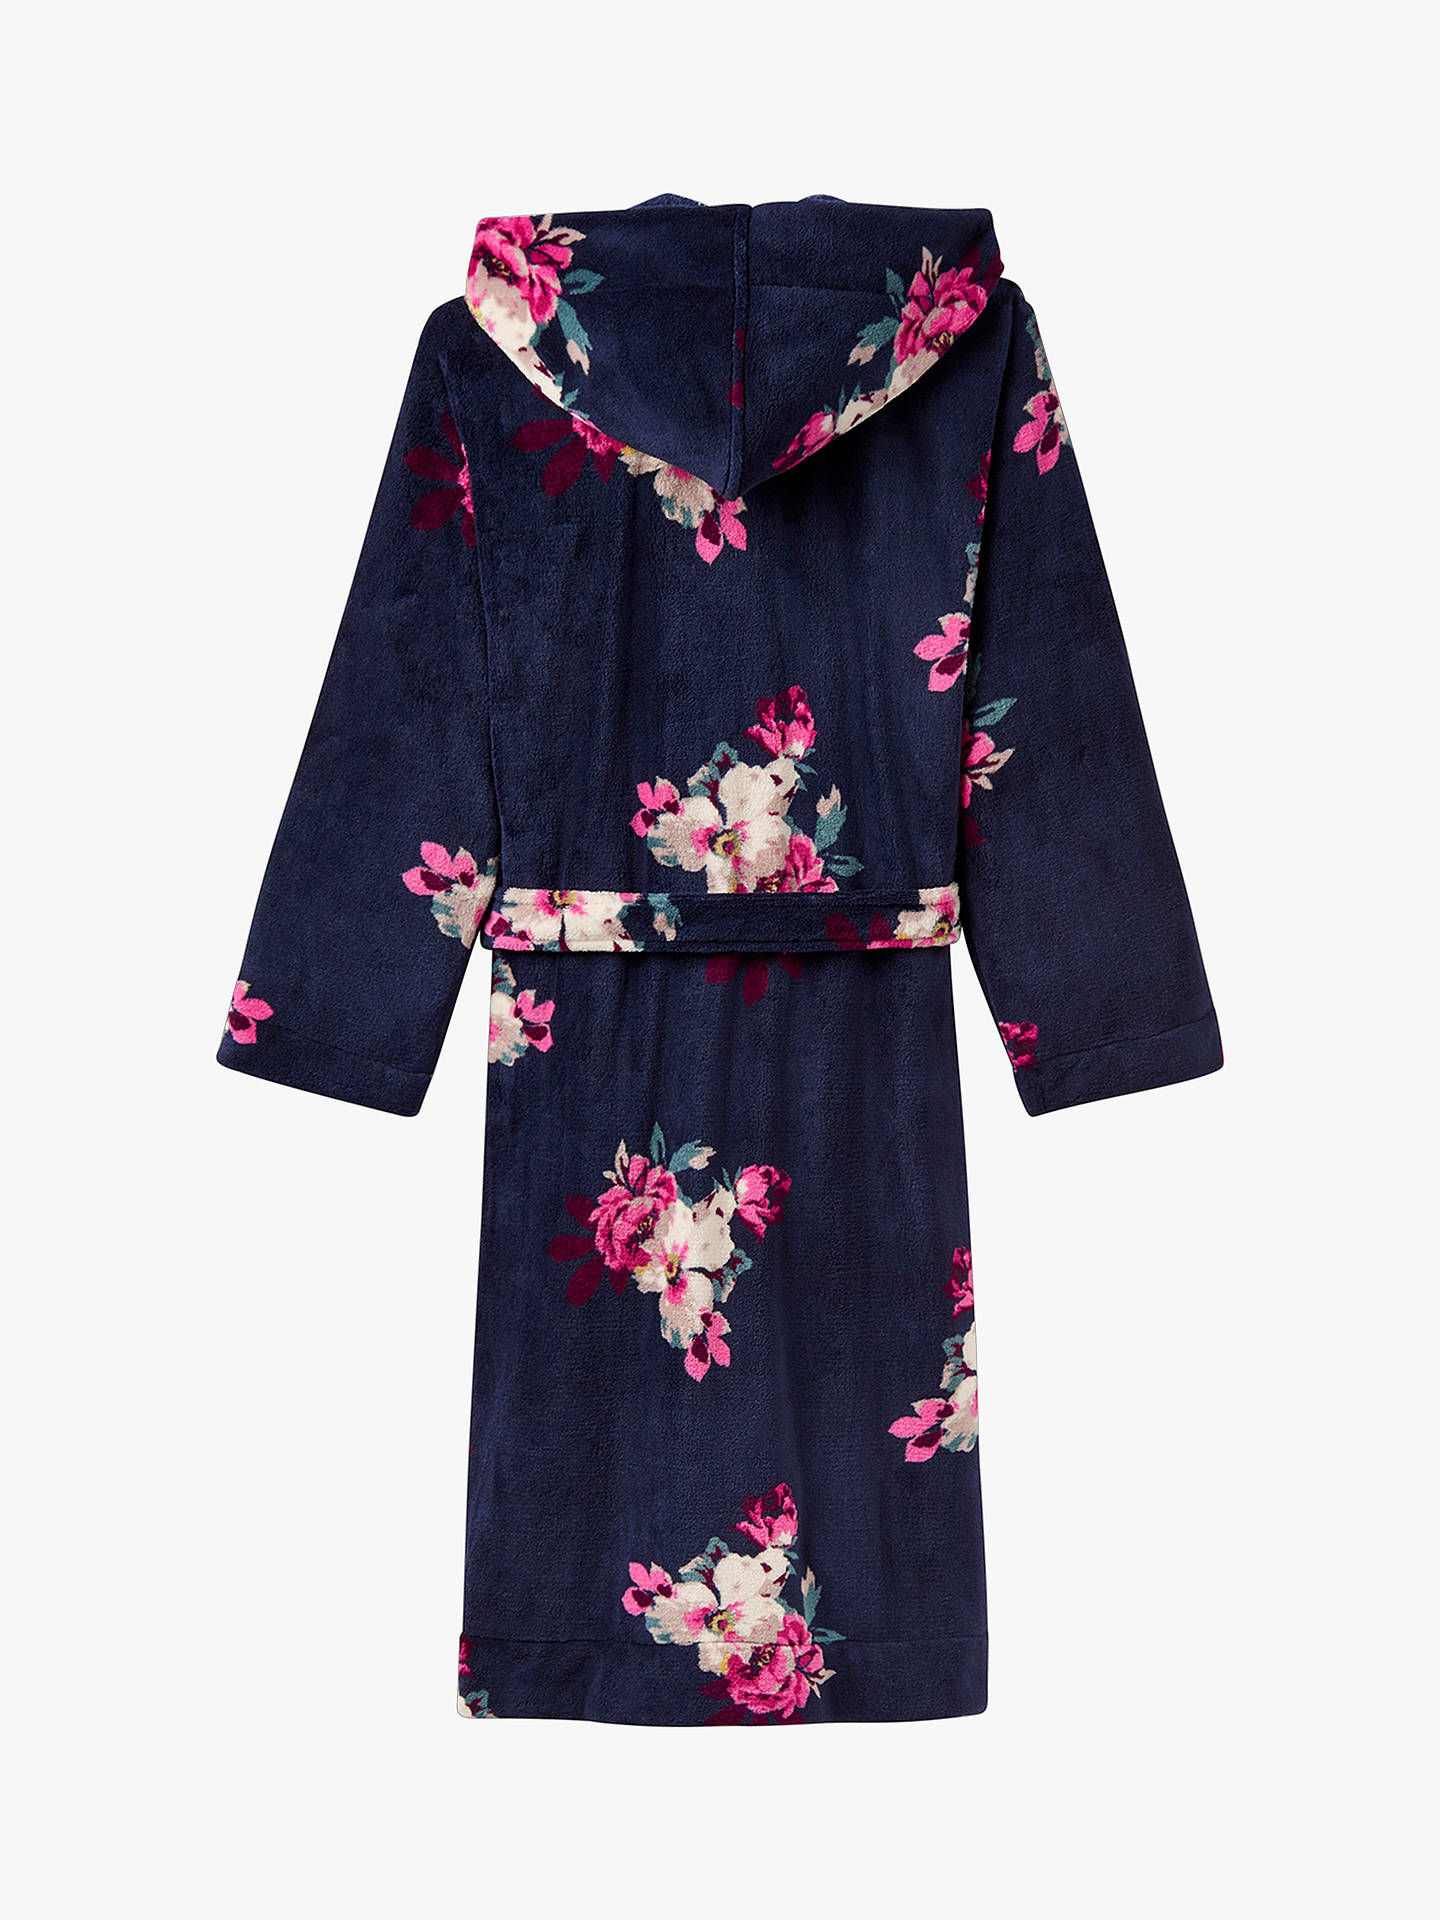 55573f82975 Buy Joules Rita Floral Print Fleece Dressing Gown